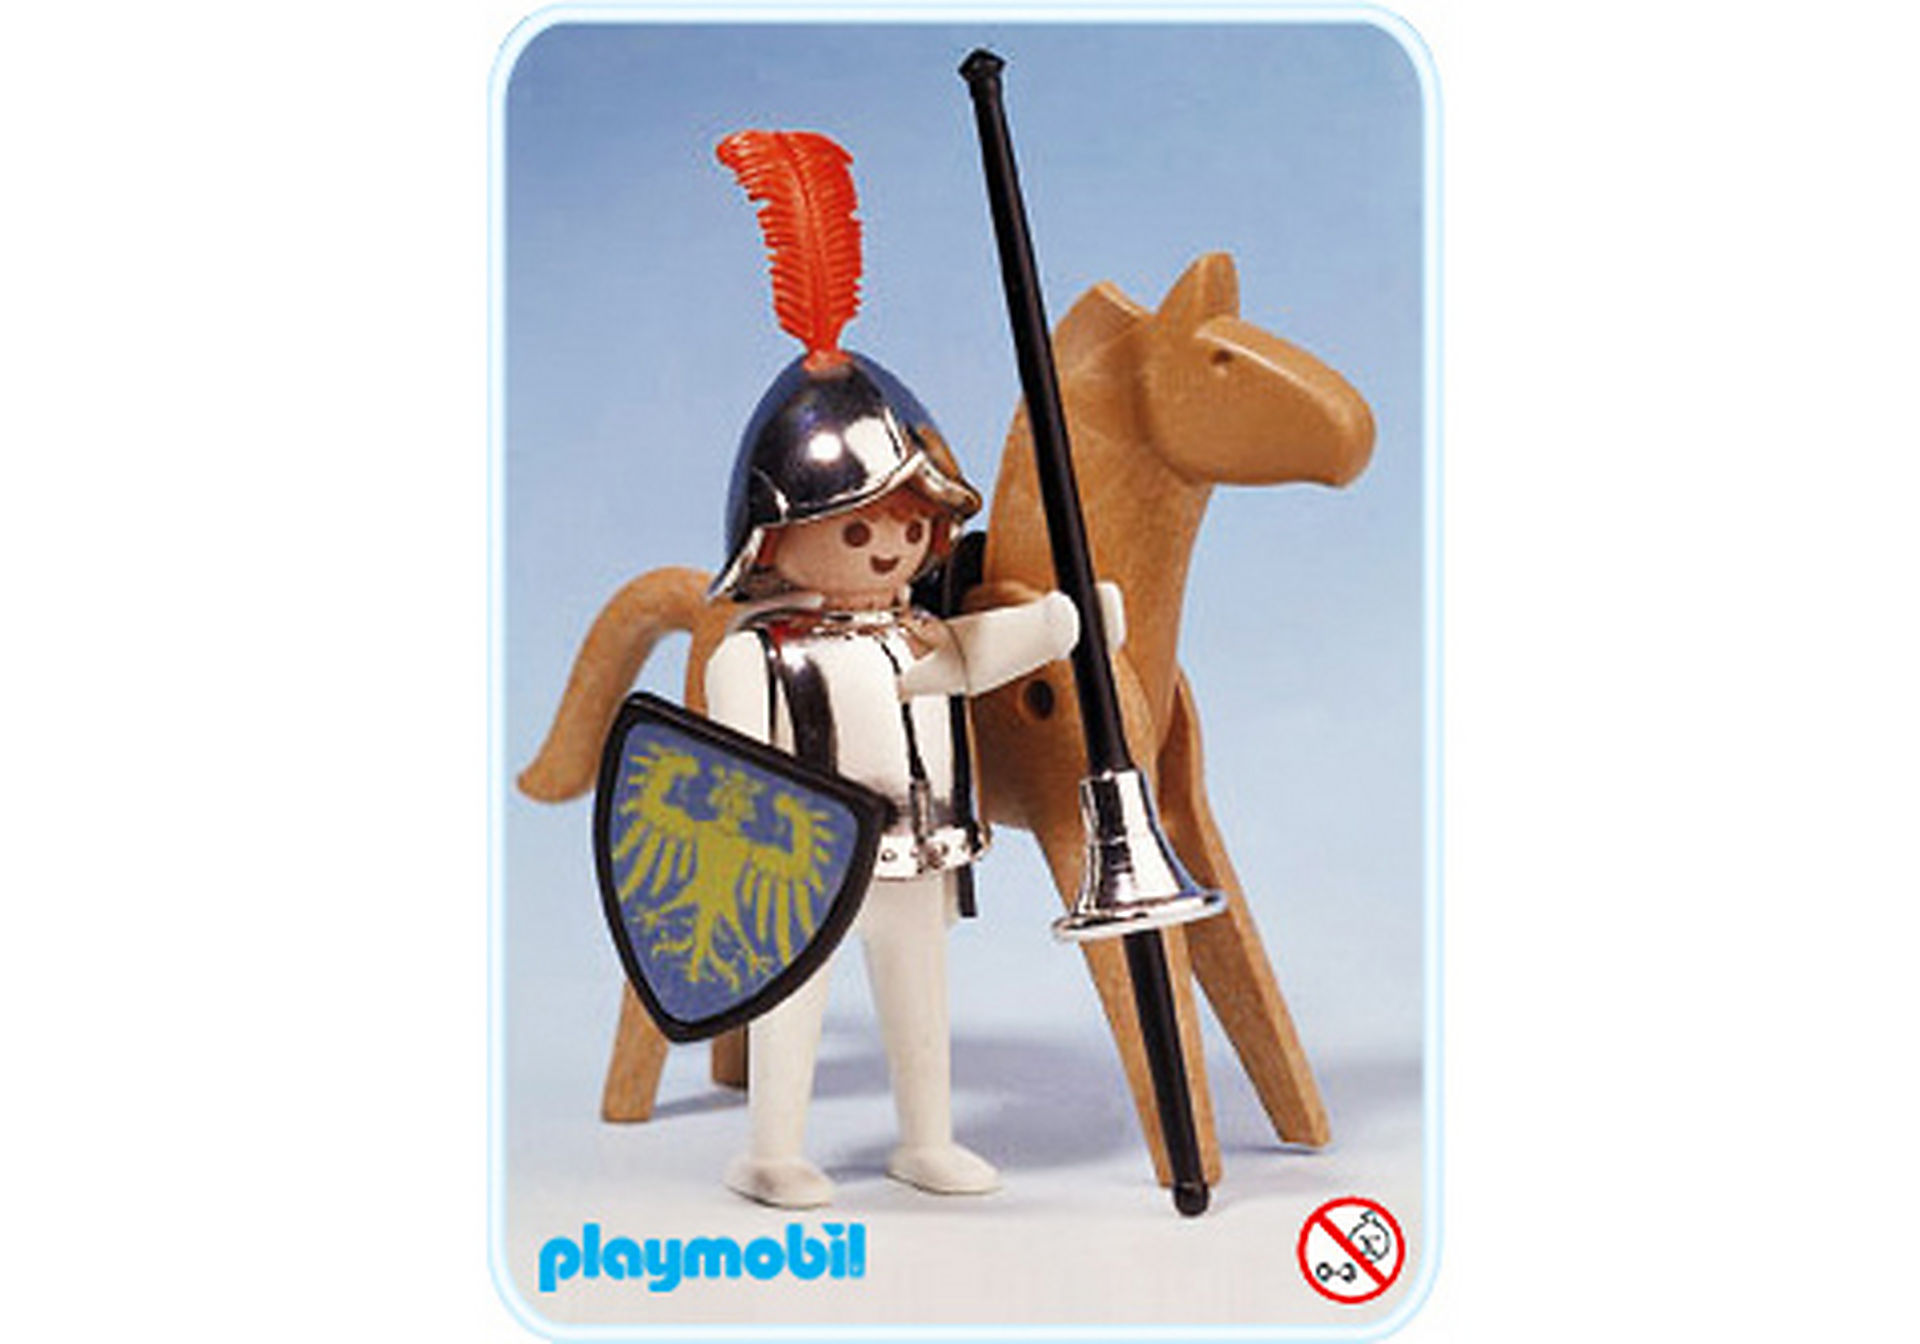 http://media.playmobil.com/i/playmobil/3379-A_product_detail/Chevalier / cheval